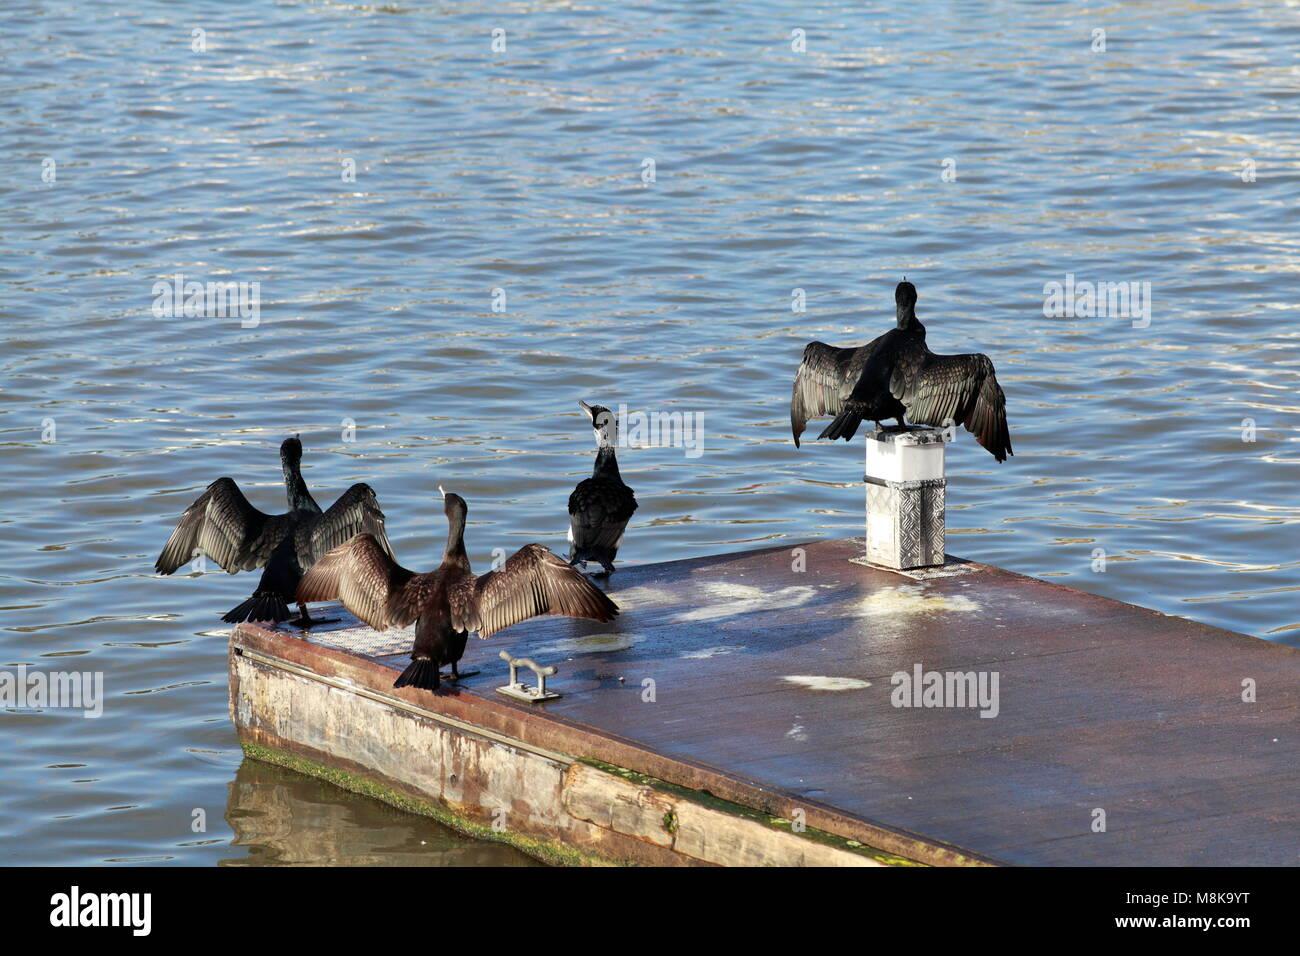 Cormorants drying their wings, Bristol Harbour, UK Stock Photo